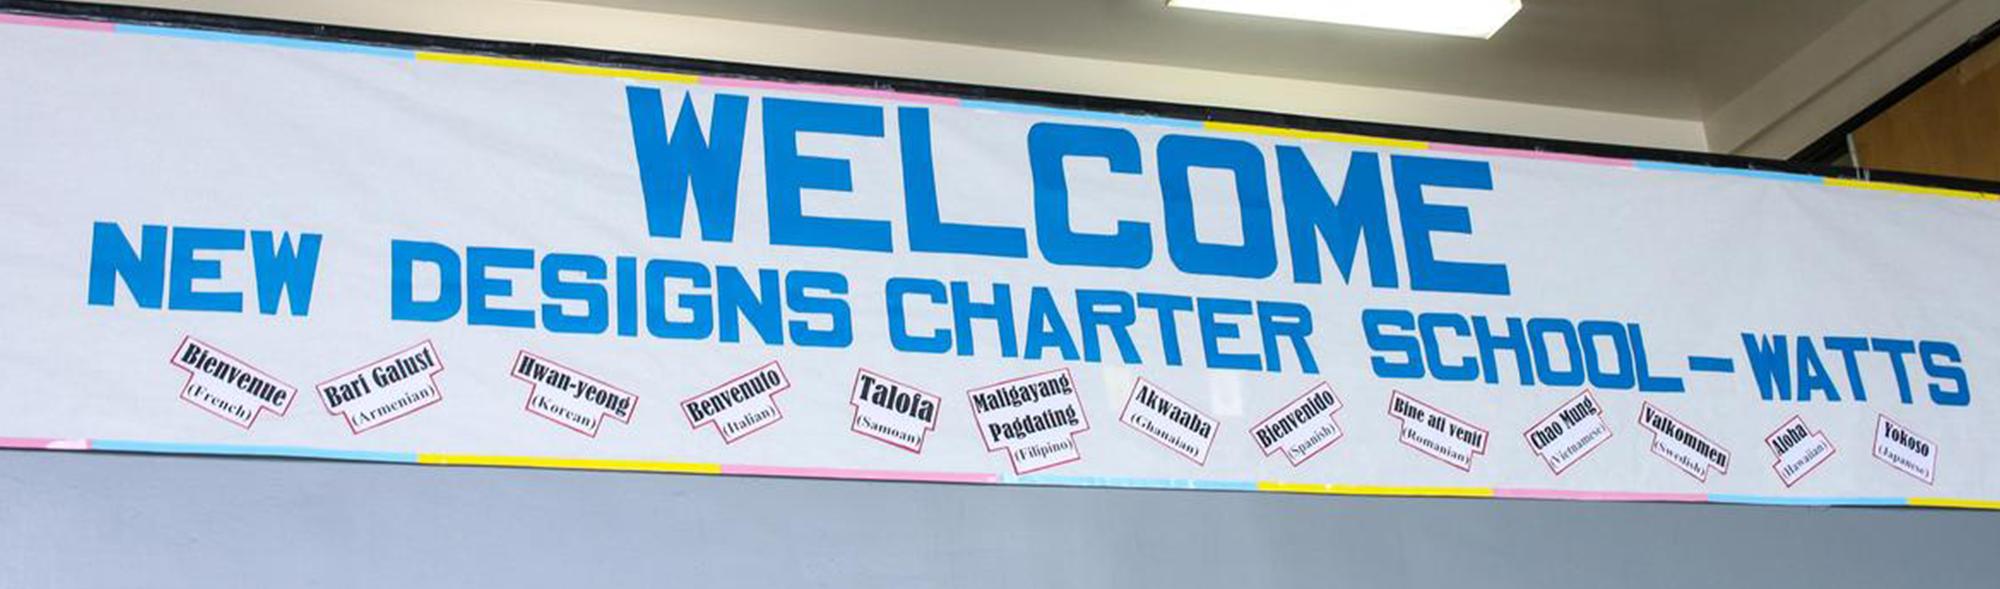 Welcome New Designs Charter School - Watts